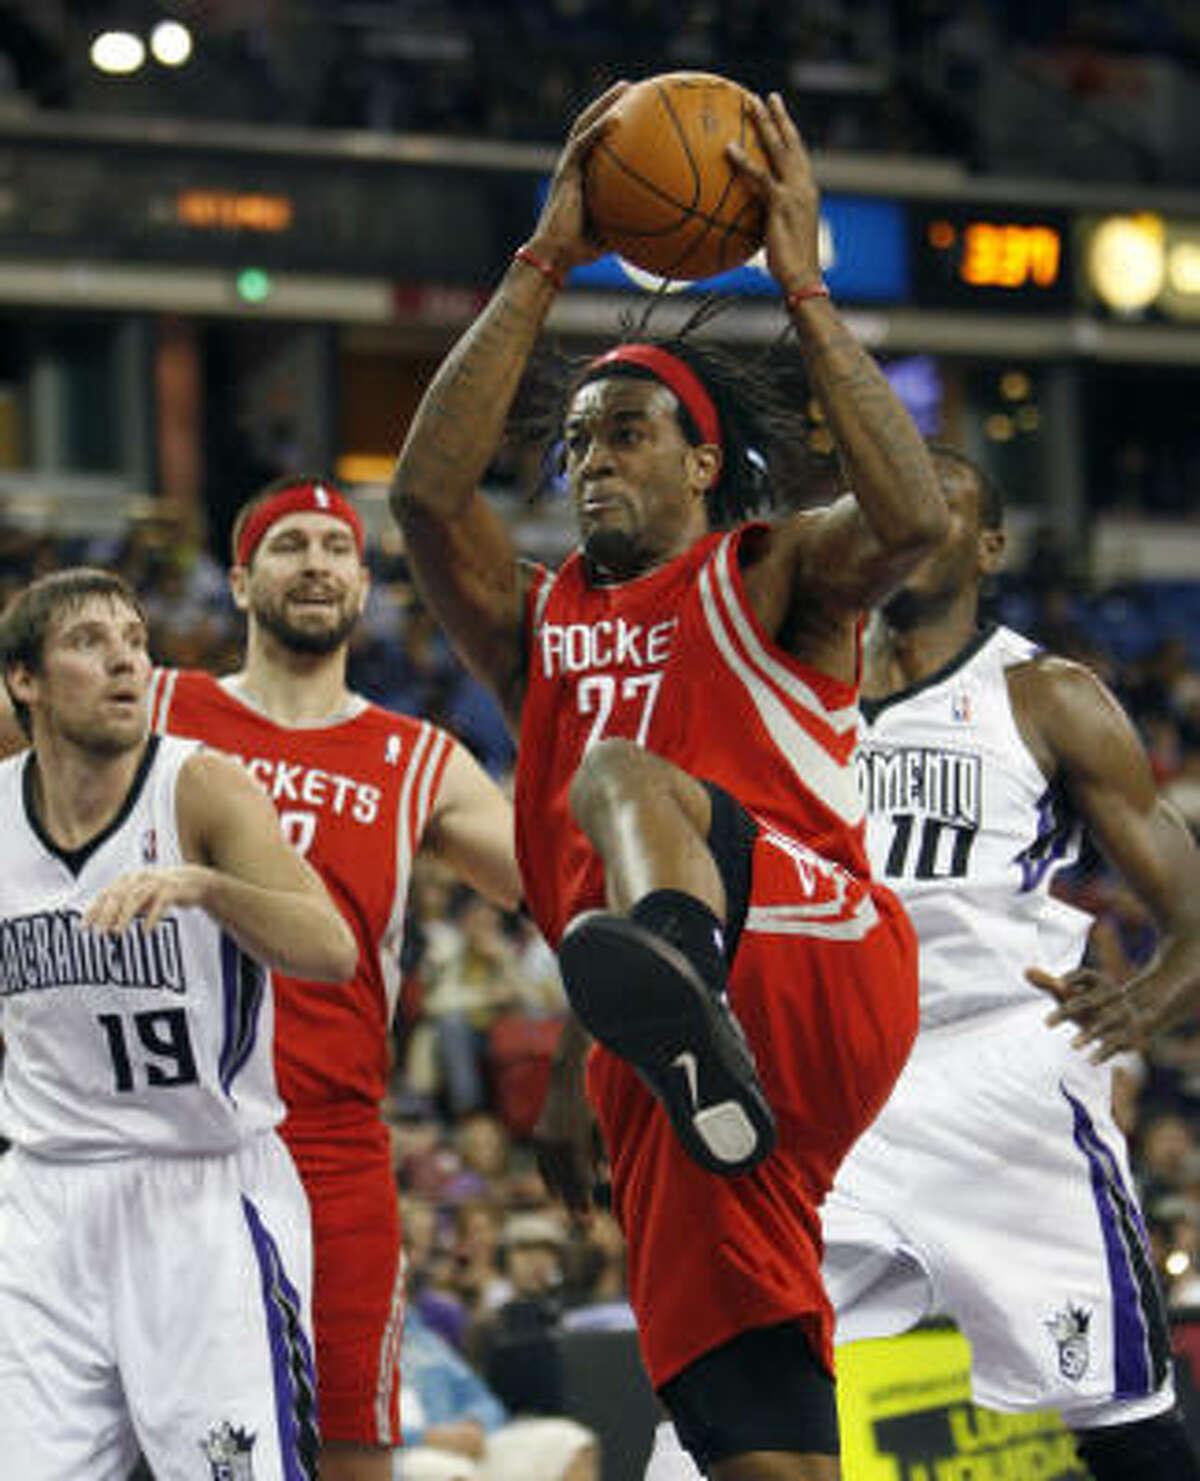 Rockets forward Jordan Hill pulls down a rebound against Kings guard Beno Udrih (19), and Samuel Dalembert during the first half.